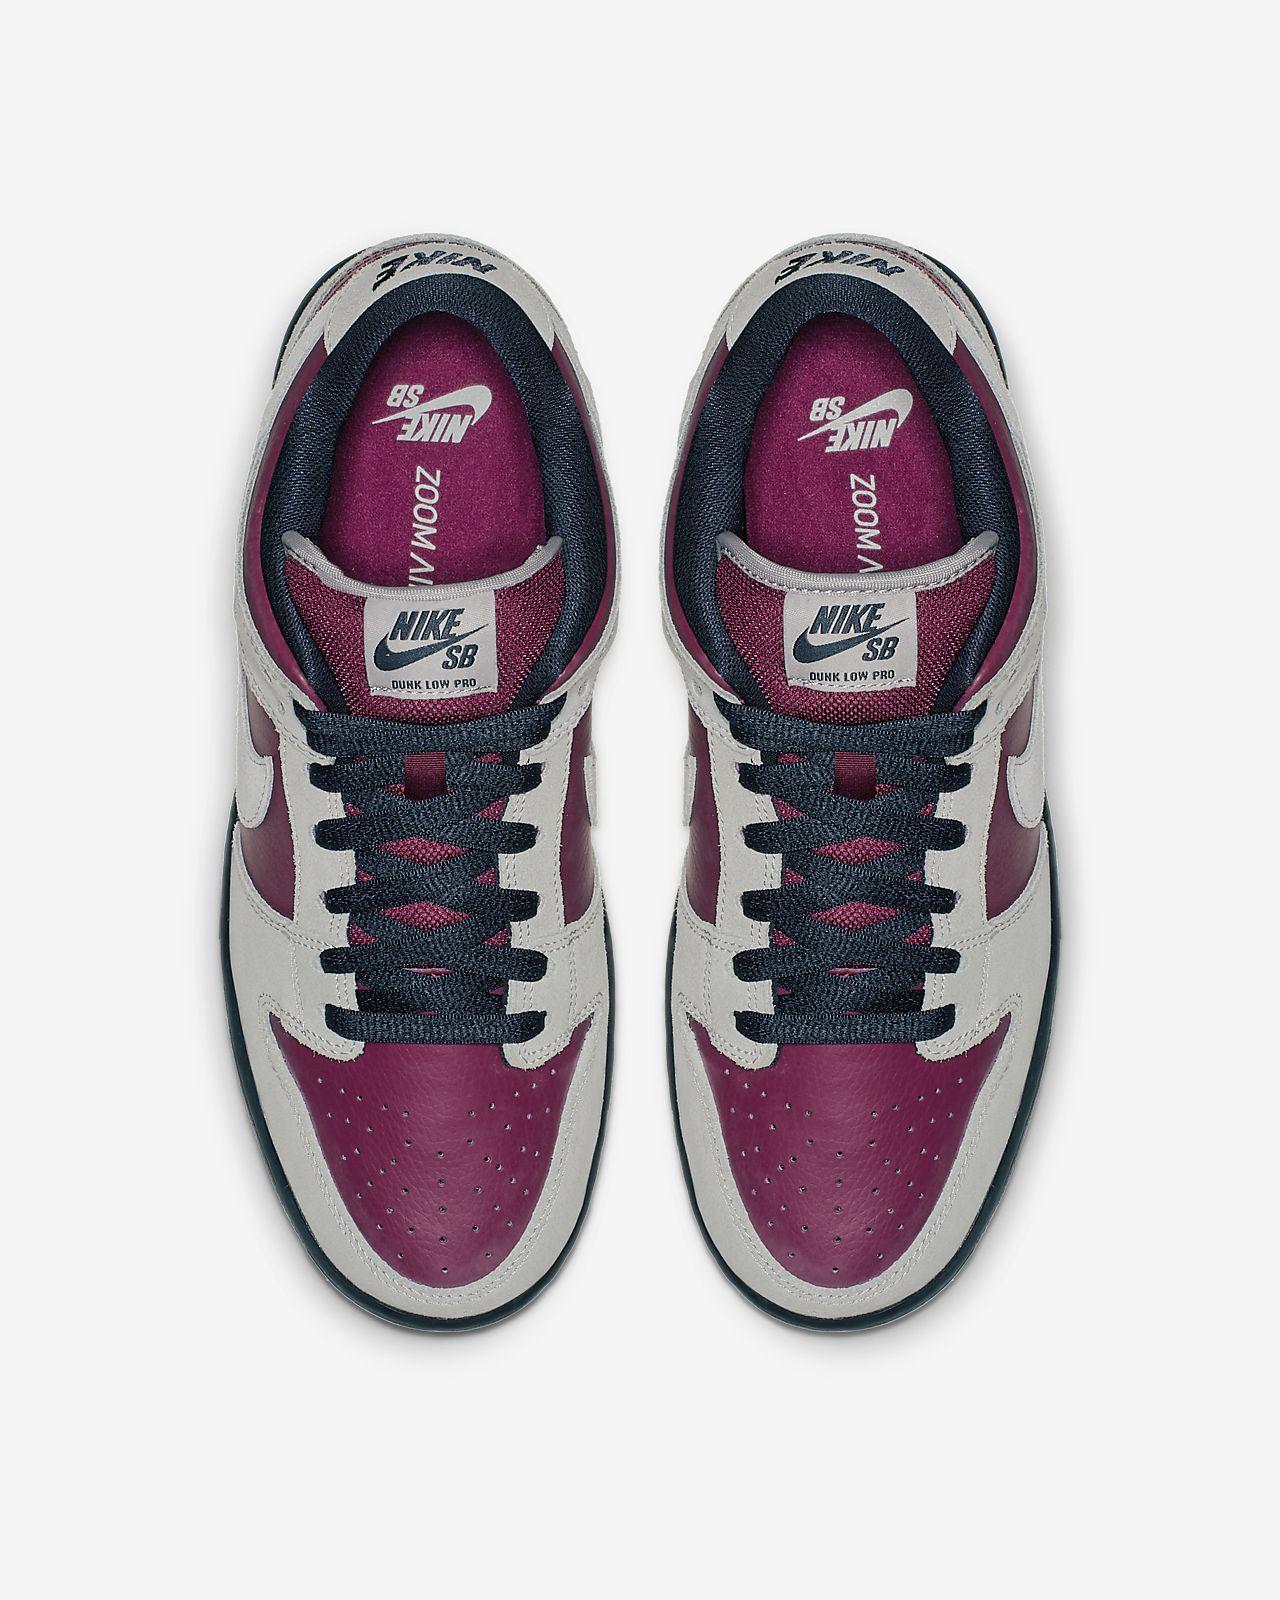 big sale 8e2a7 bf447 ... Nike SB Dunk Low Pro Skate Shoe